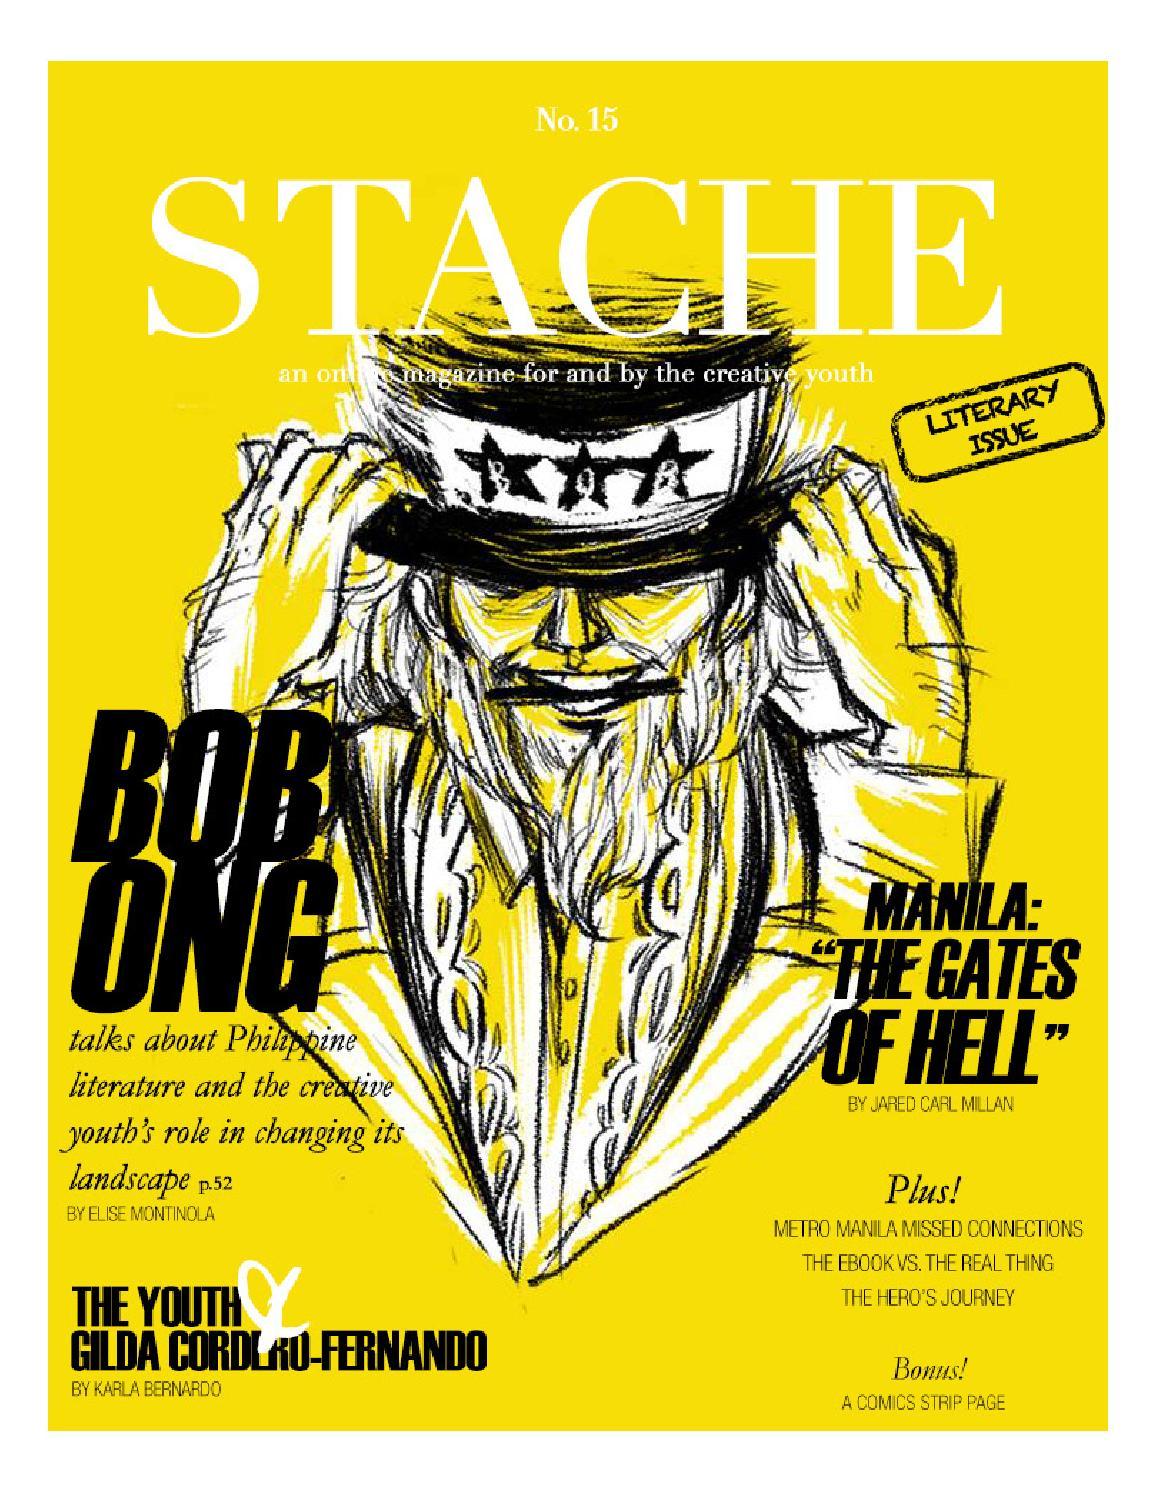 Stache June 2013 // Issue 15 by Stache Magazine - issuu